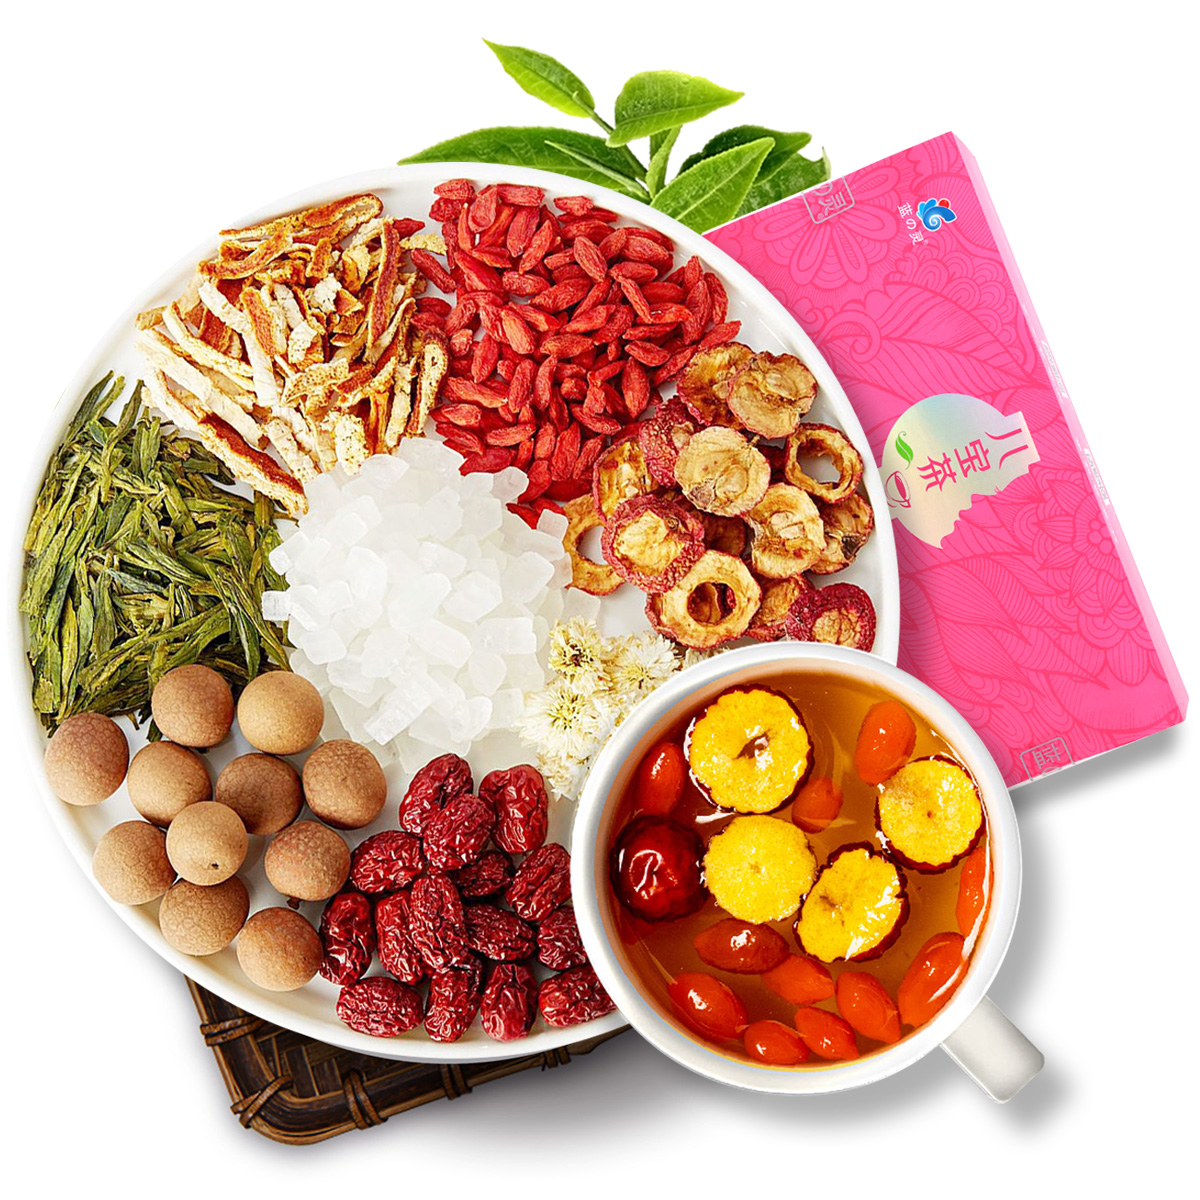 Chinese Herbal Flower Tea Whitening Herbal Tea Assorted Chinese Herbal Tea - 4uTea   4uTea.com